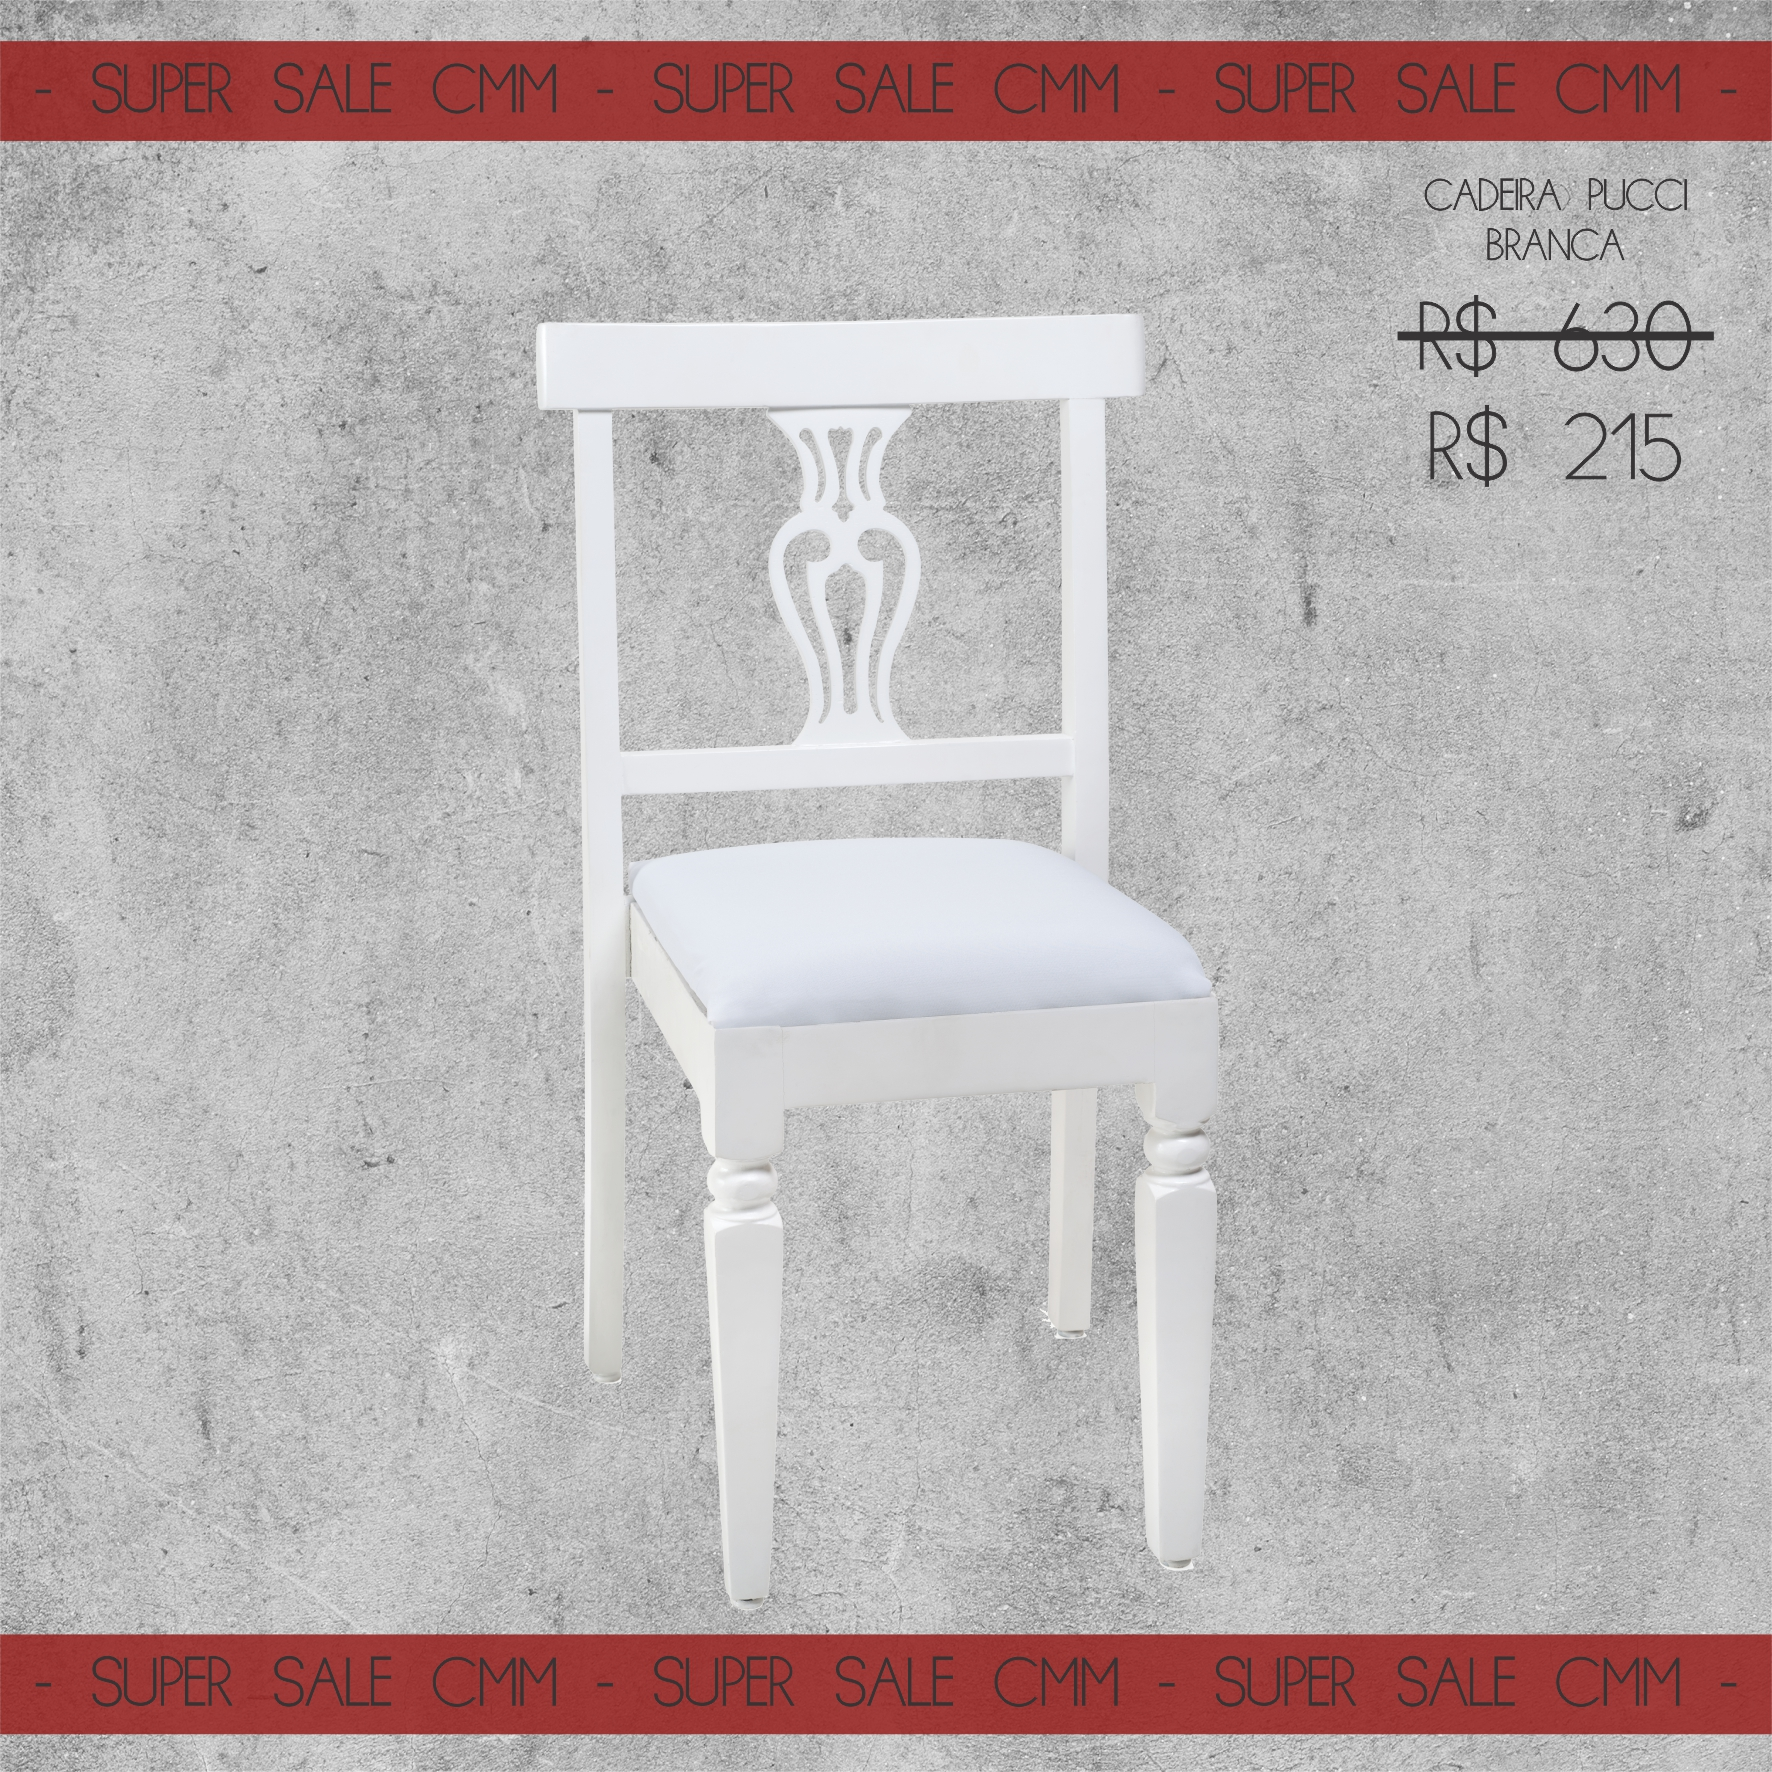 Super Sale Cadeira Pucci Branca